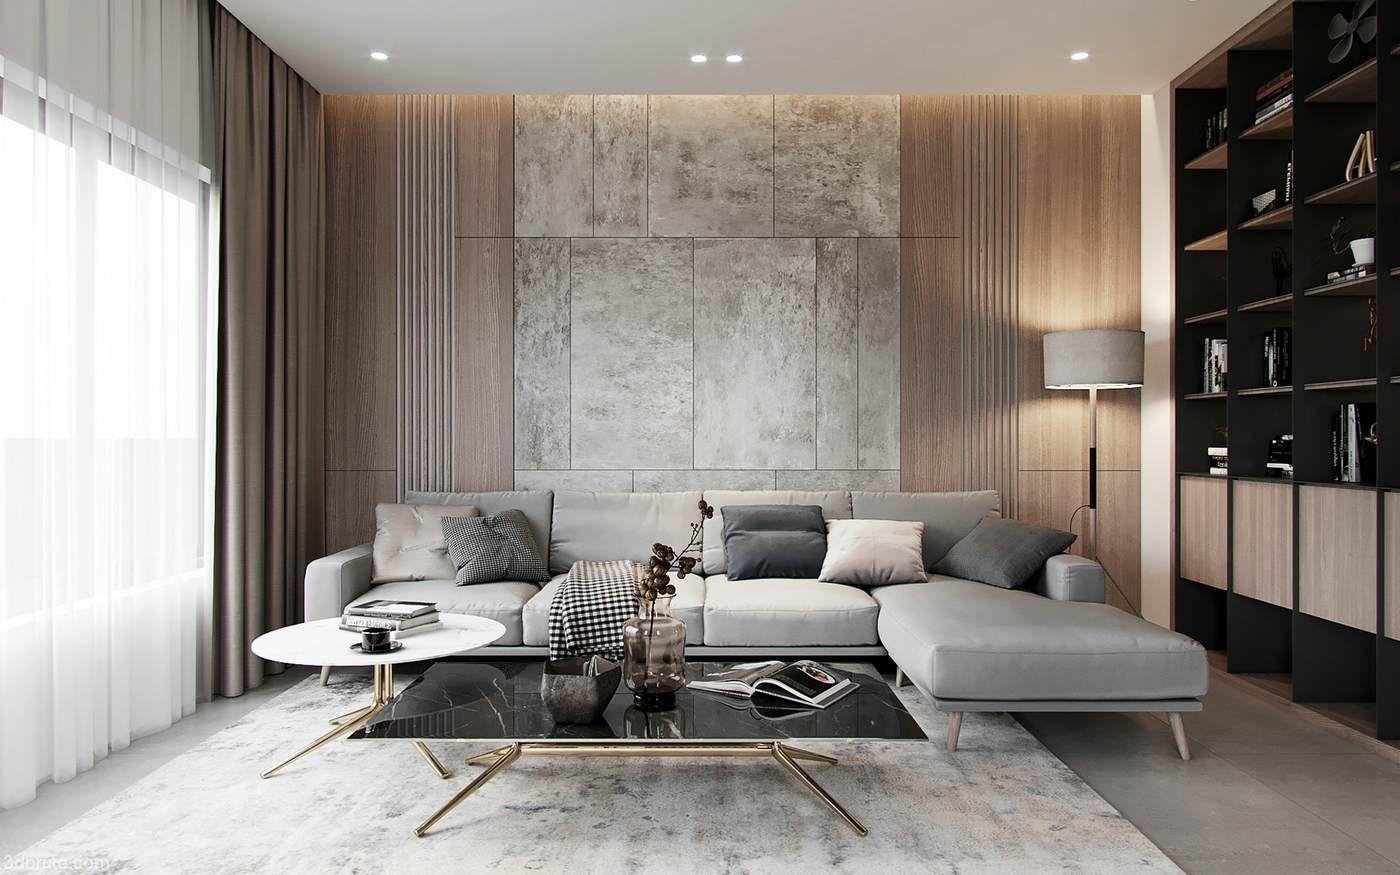 Tung Le Collection Download 3d Models Free 3dbrute Living Room Design Modern Interior Design Living Room Living Room Designs